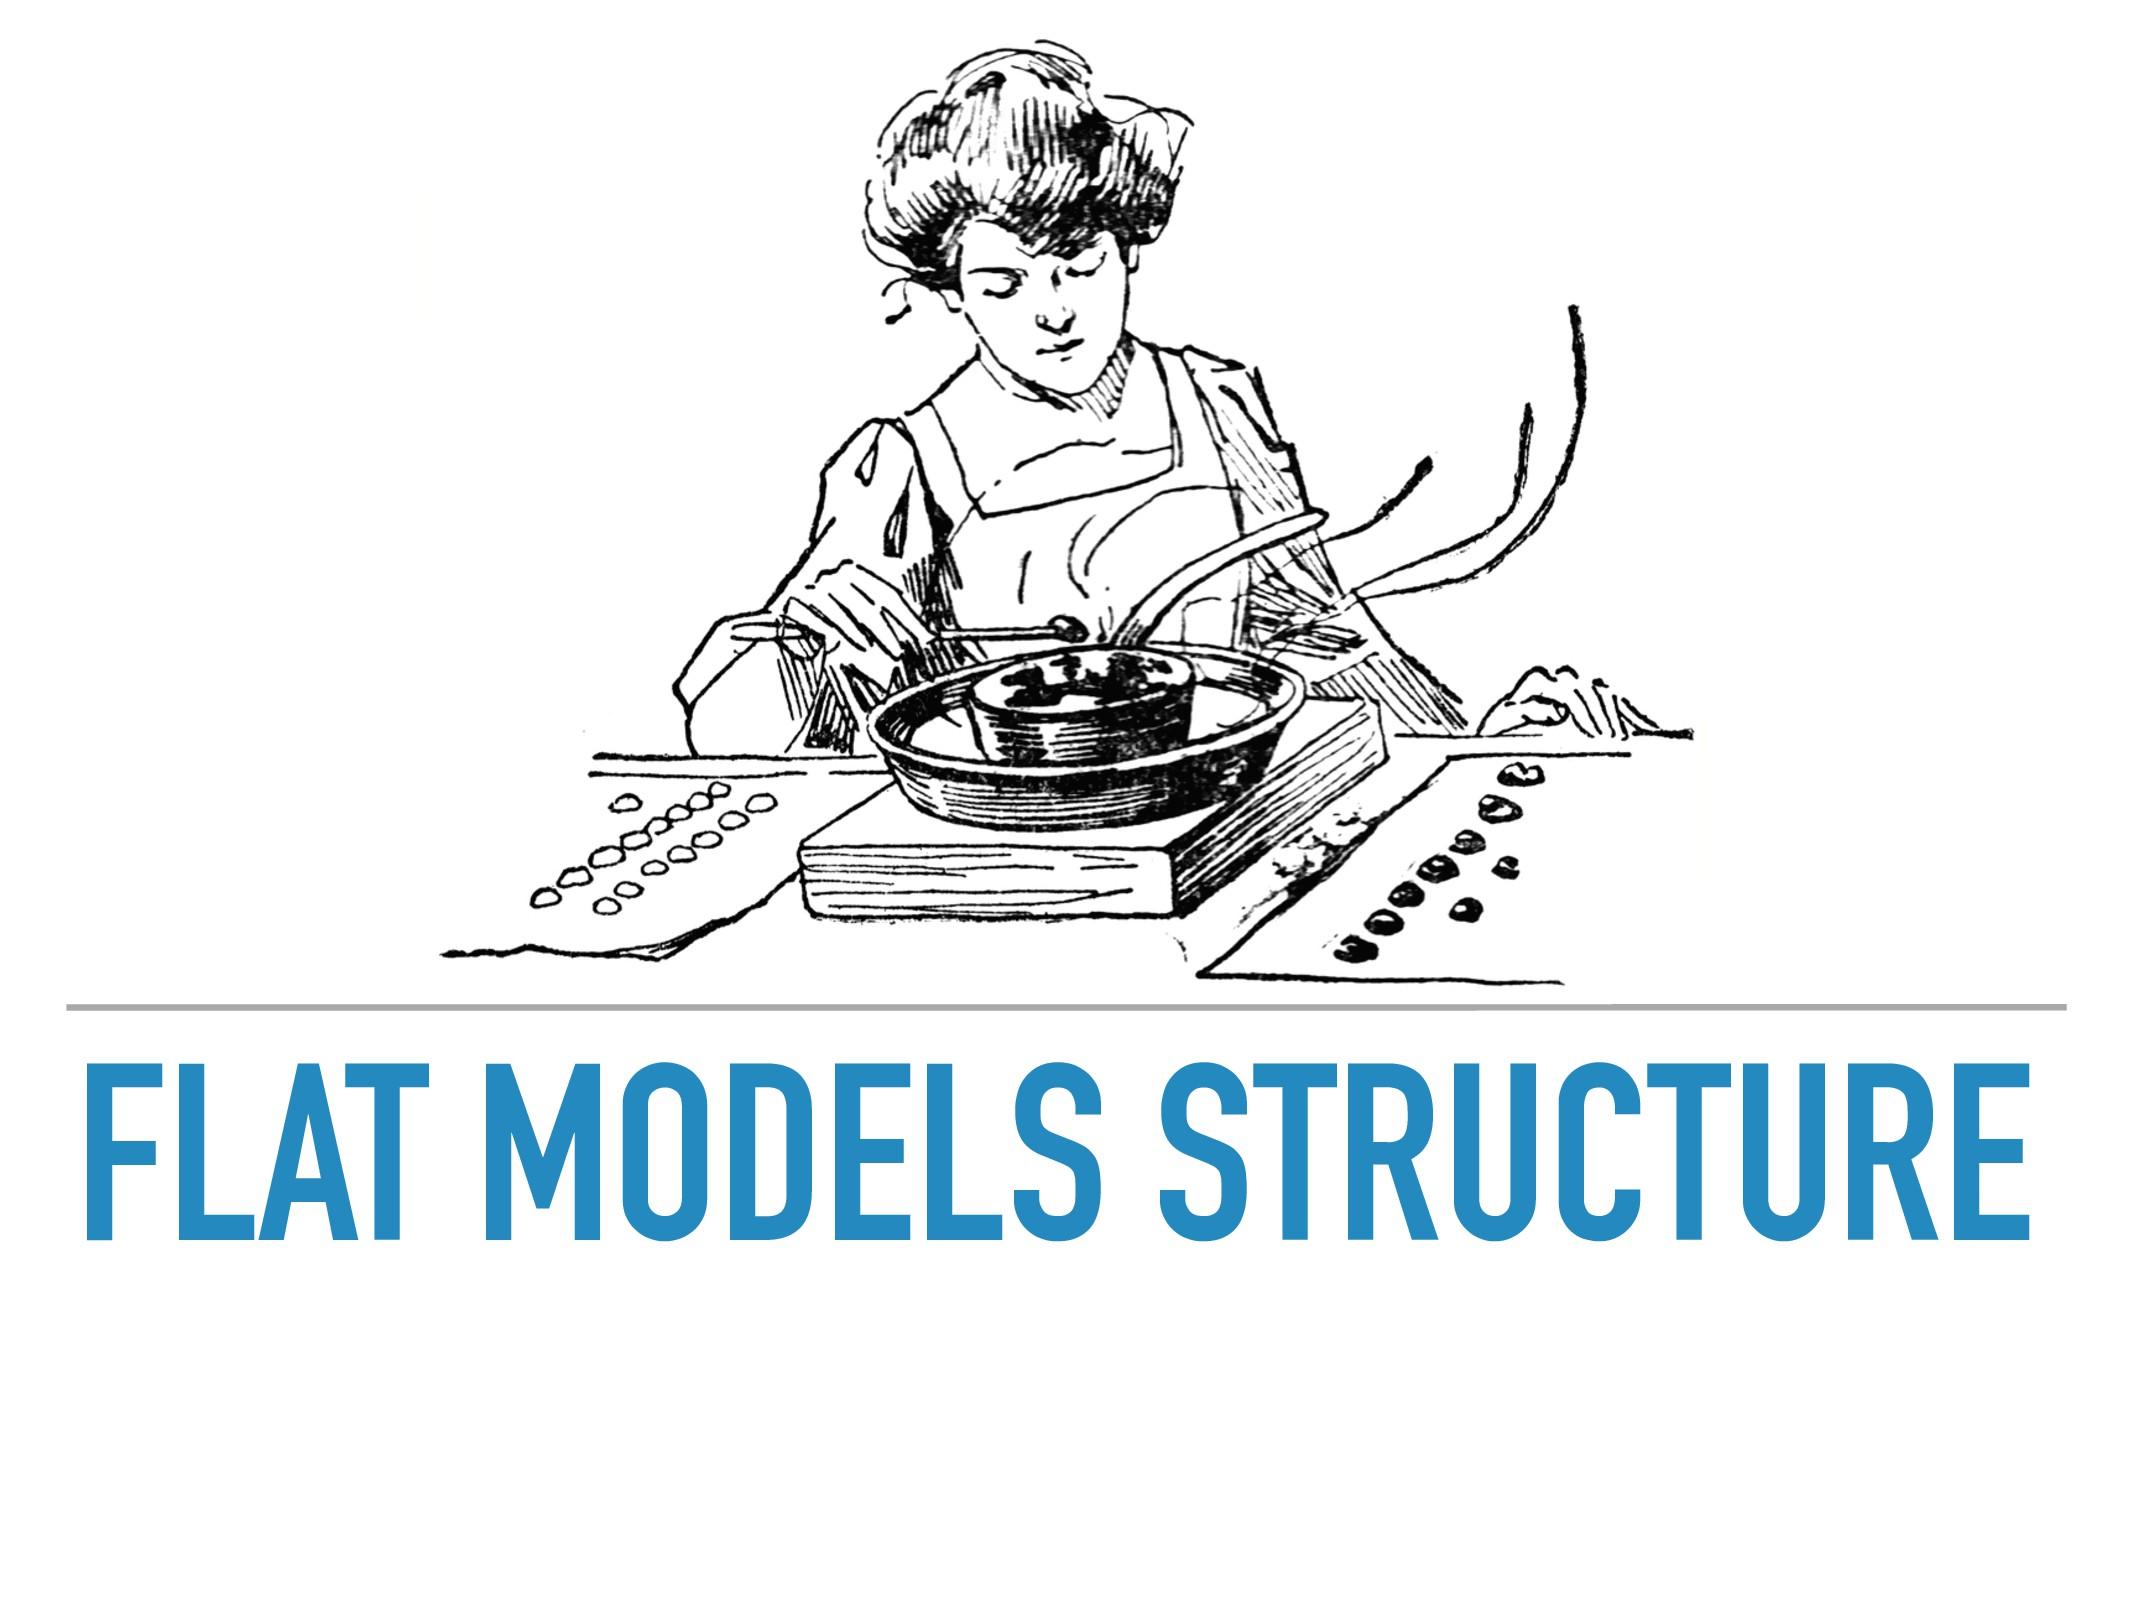 FLAT MODELS STRUCTURE